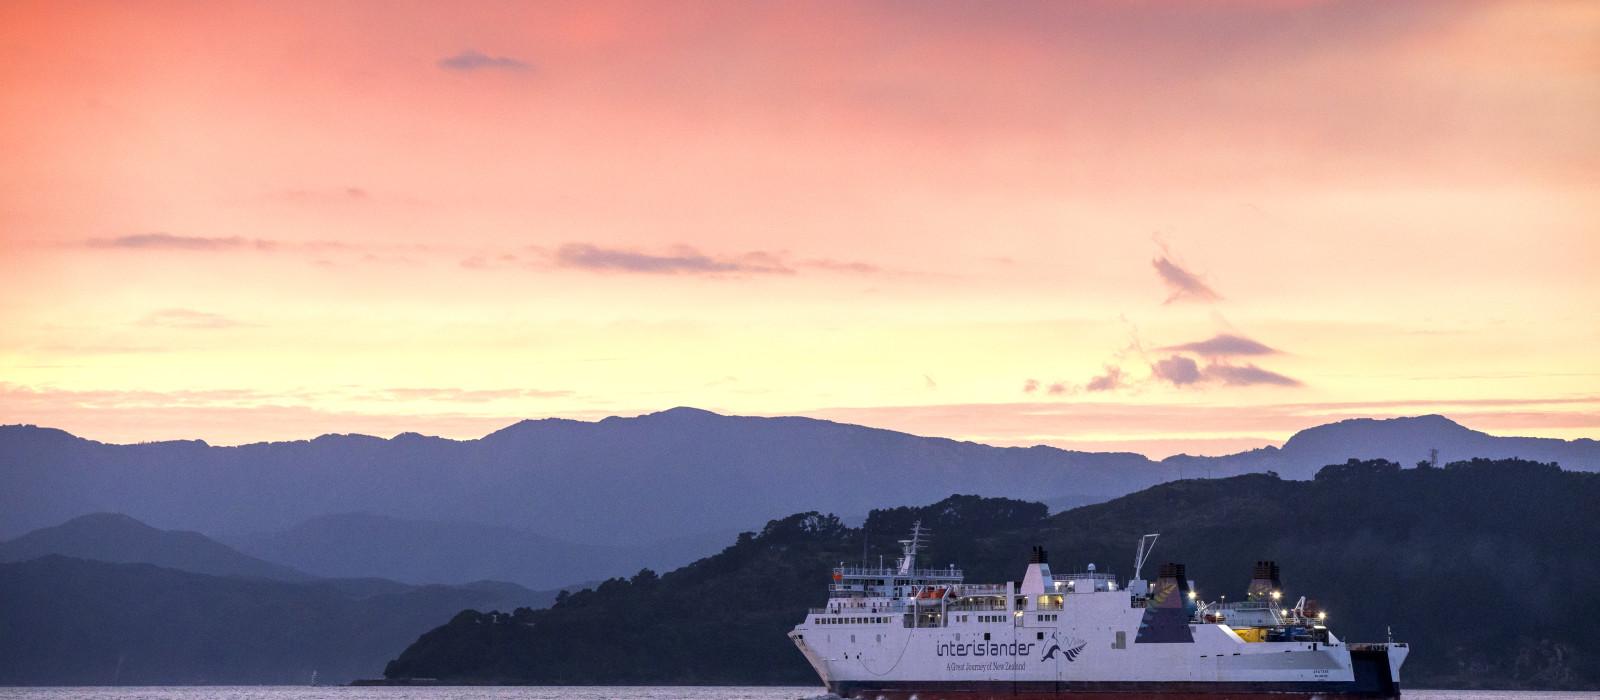 Destination Picton New Zealand